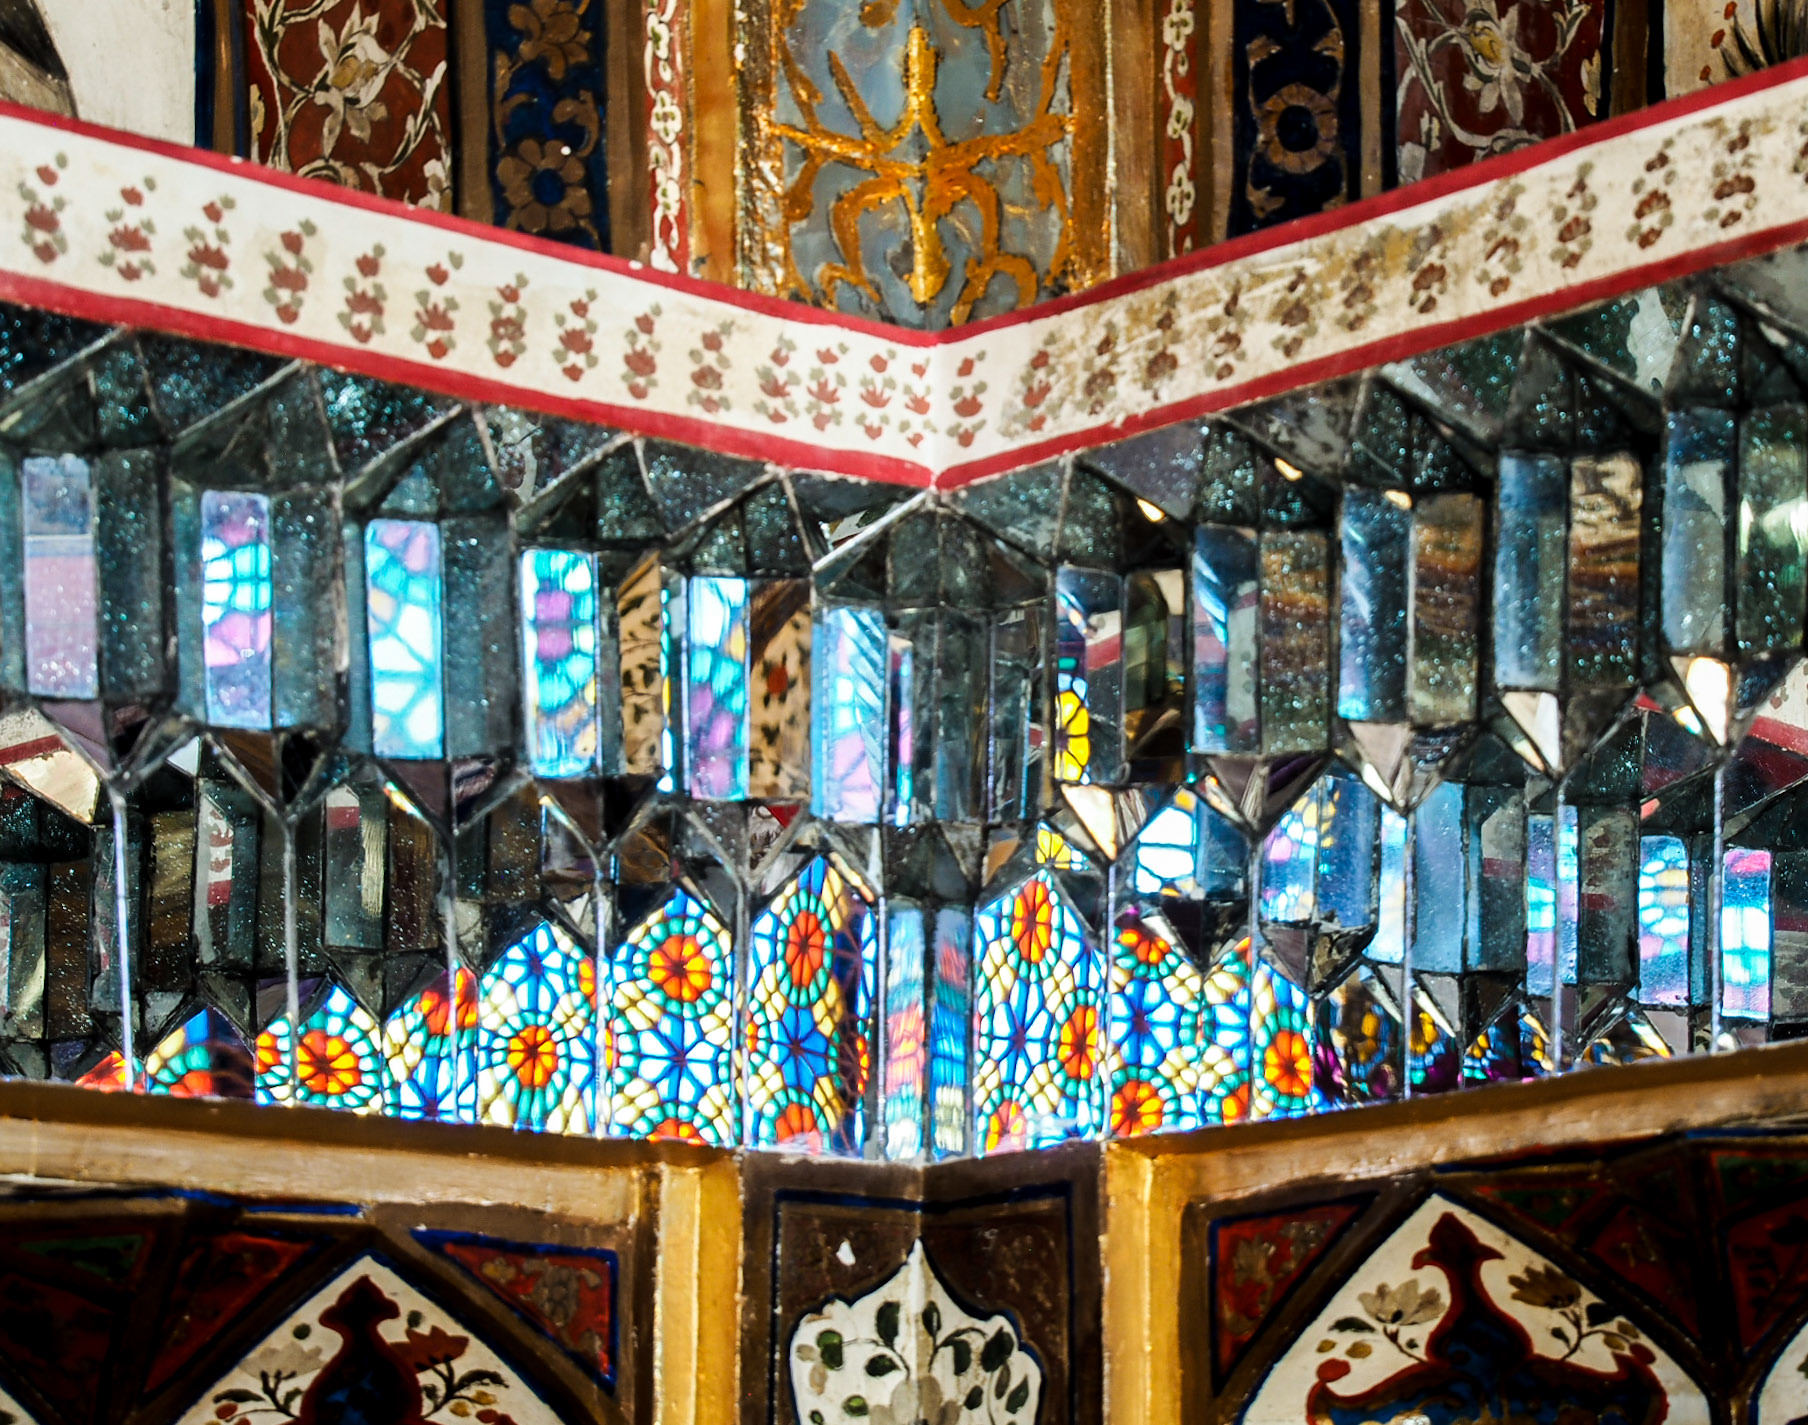 medival-mirrors-khans-winter-palace-sheki.jpeg